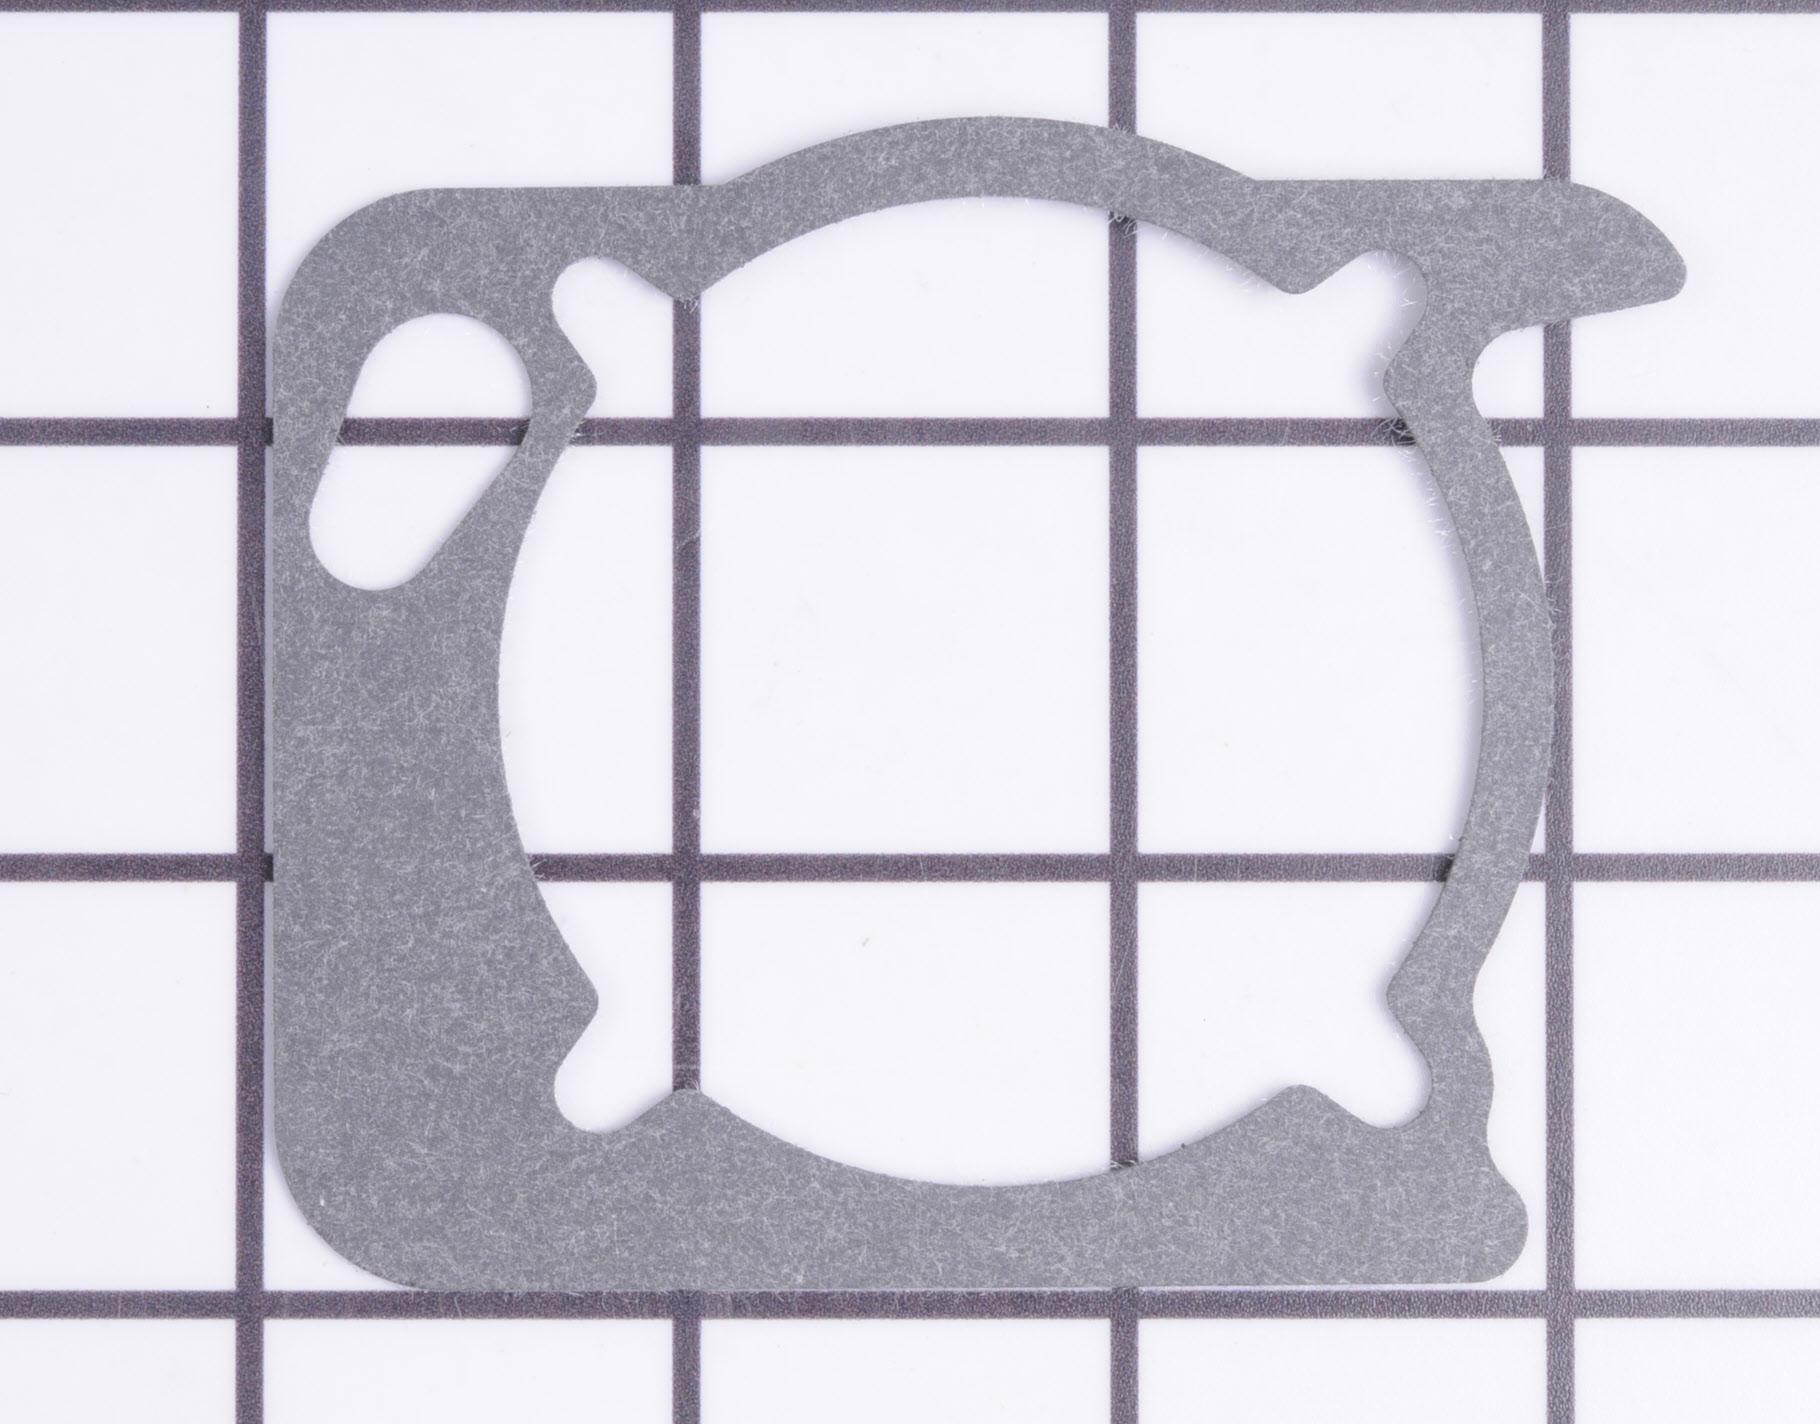 753-1208 Ryobi Leaf Blower Part -Gasket